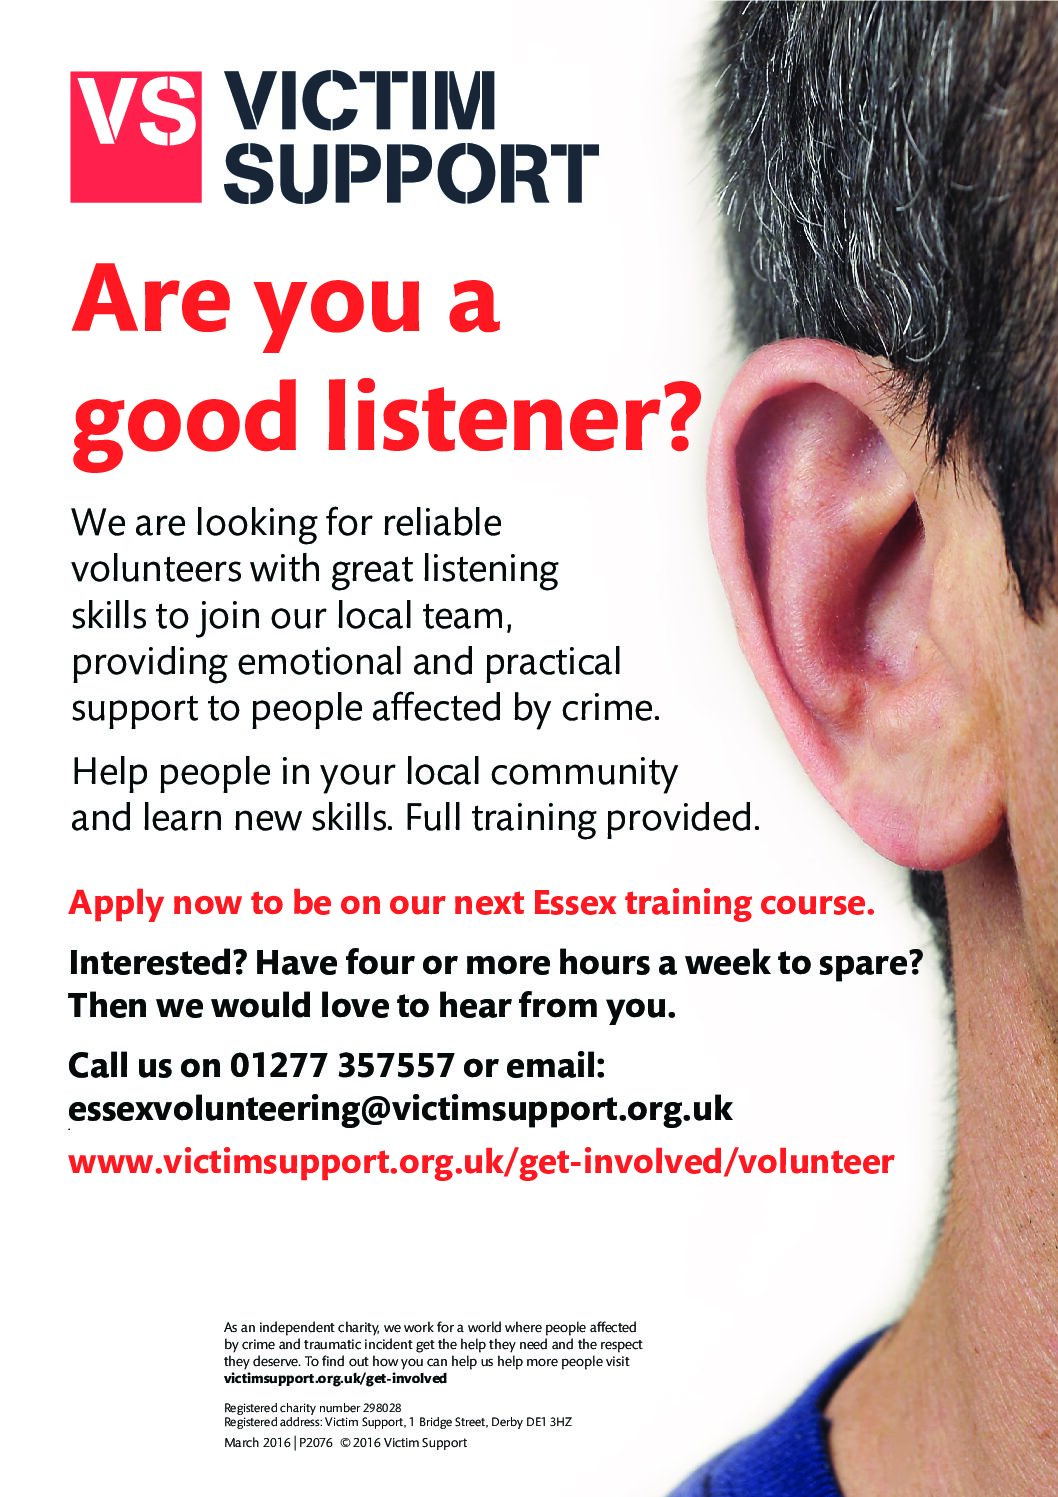 Volunteer with Victim Support